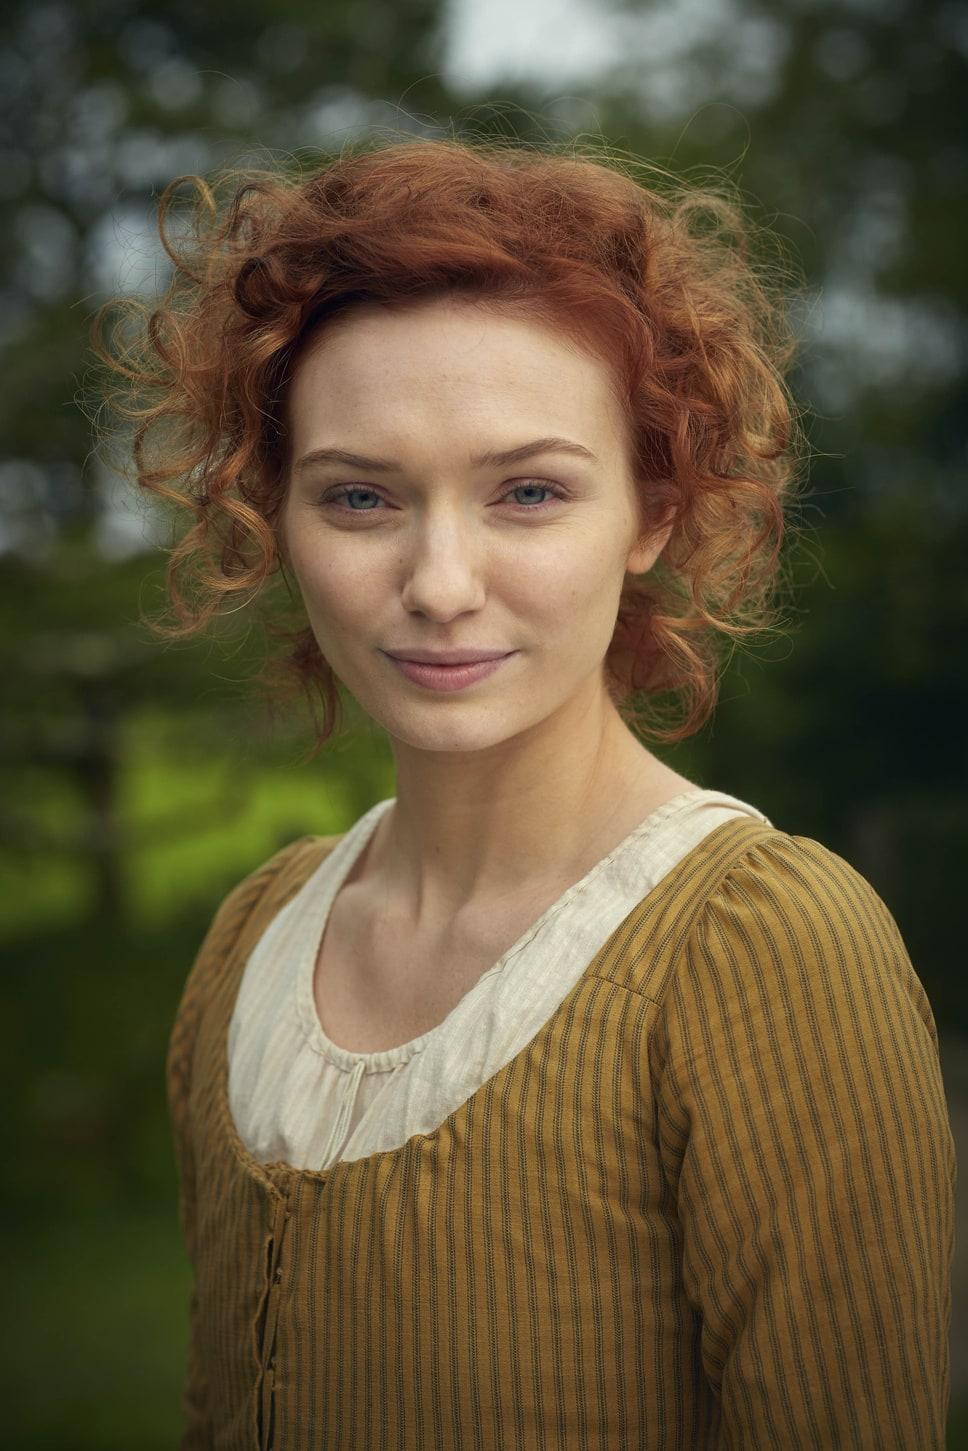 Picture of Eleanor Tomlinson